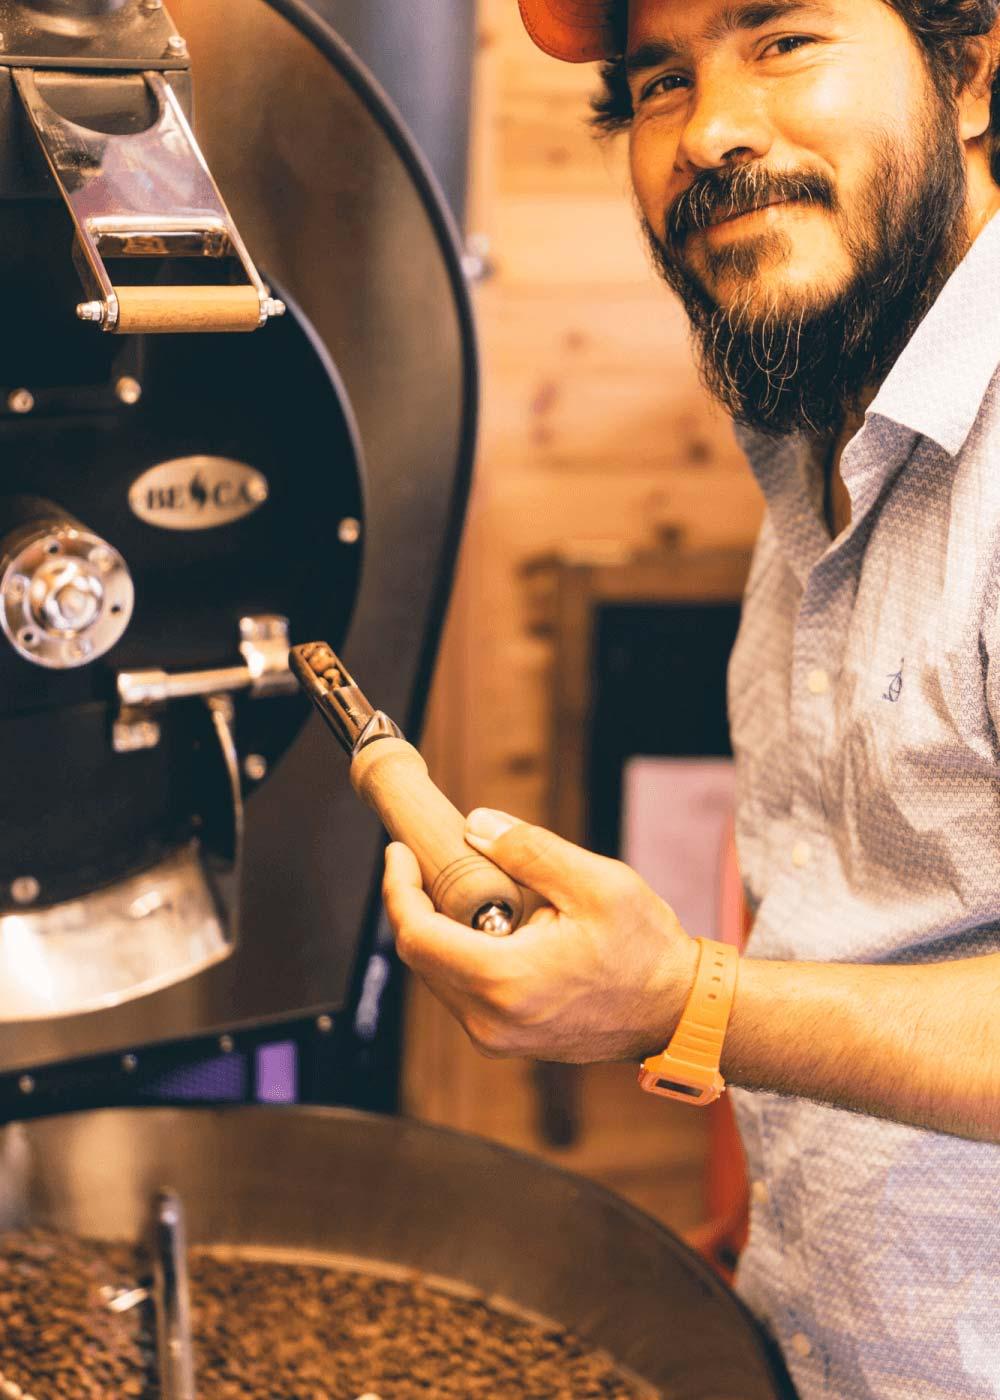 Juan roasting coffee